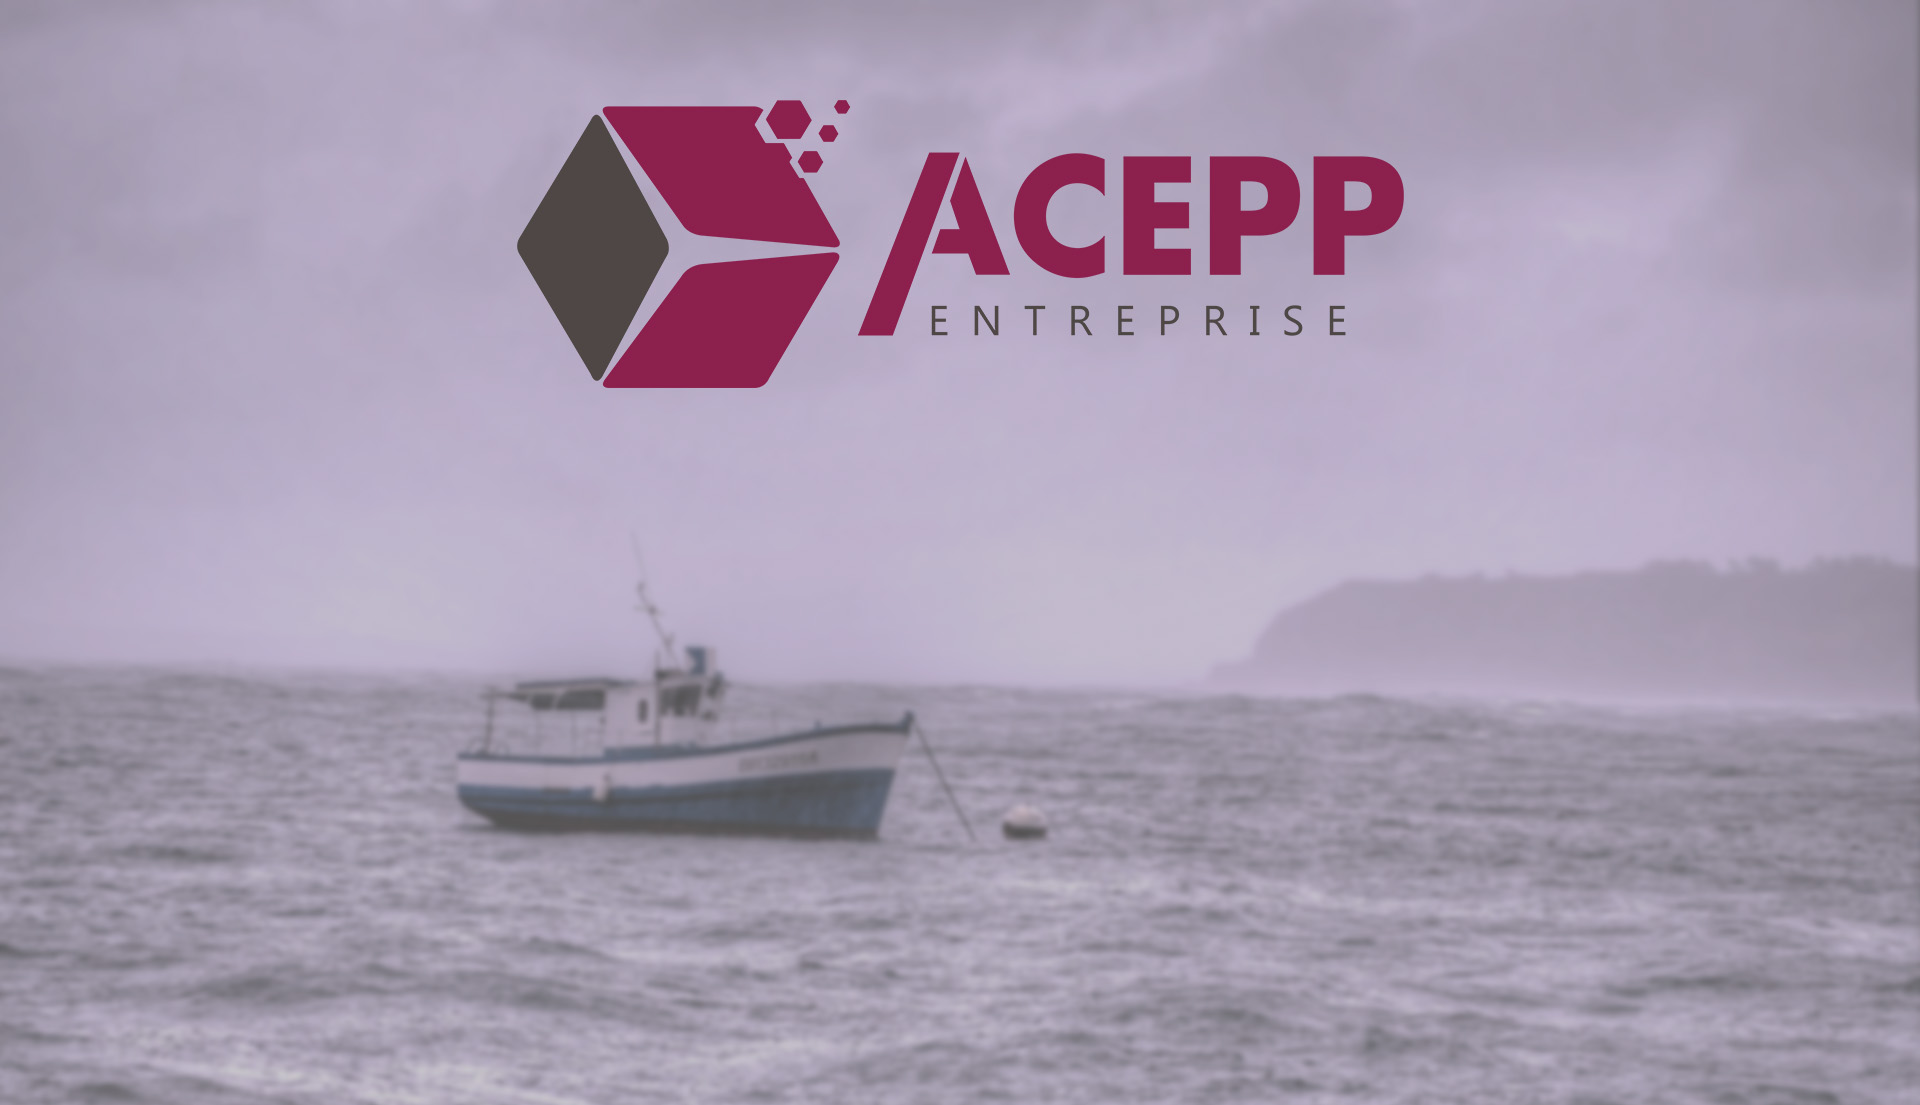 Acepp Entreprise